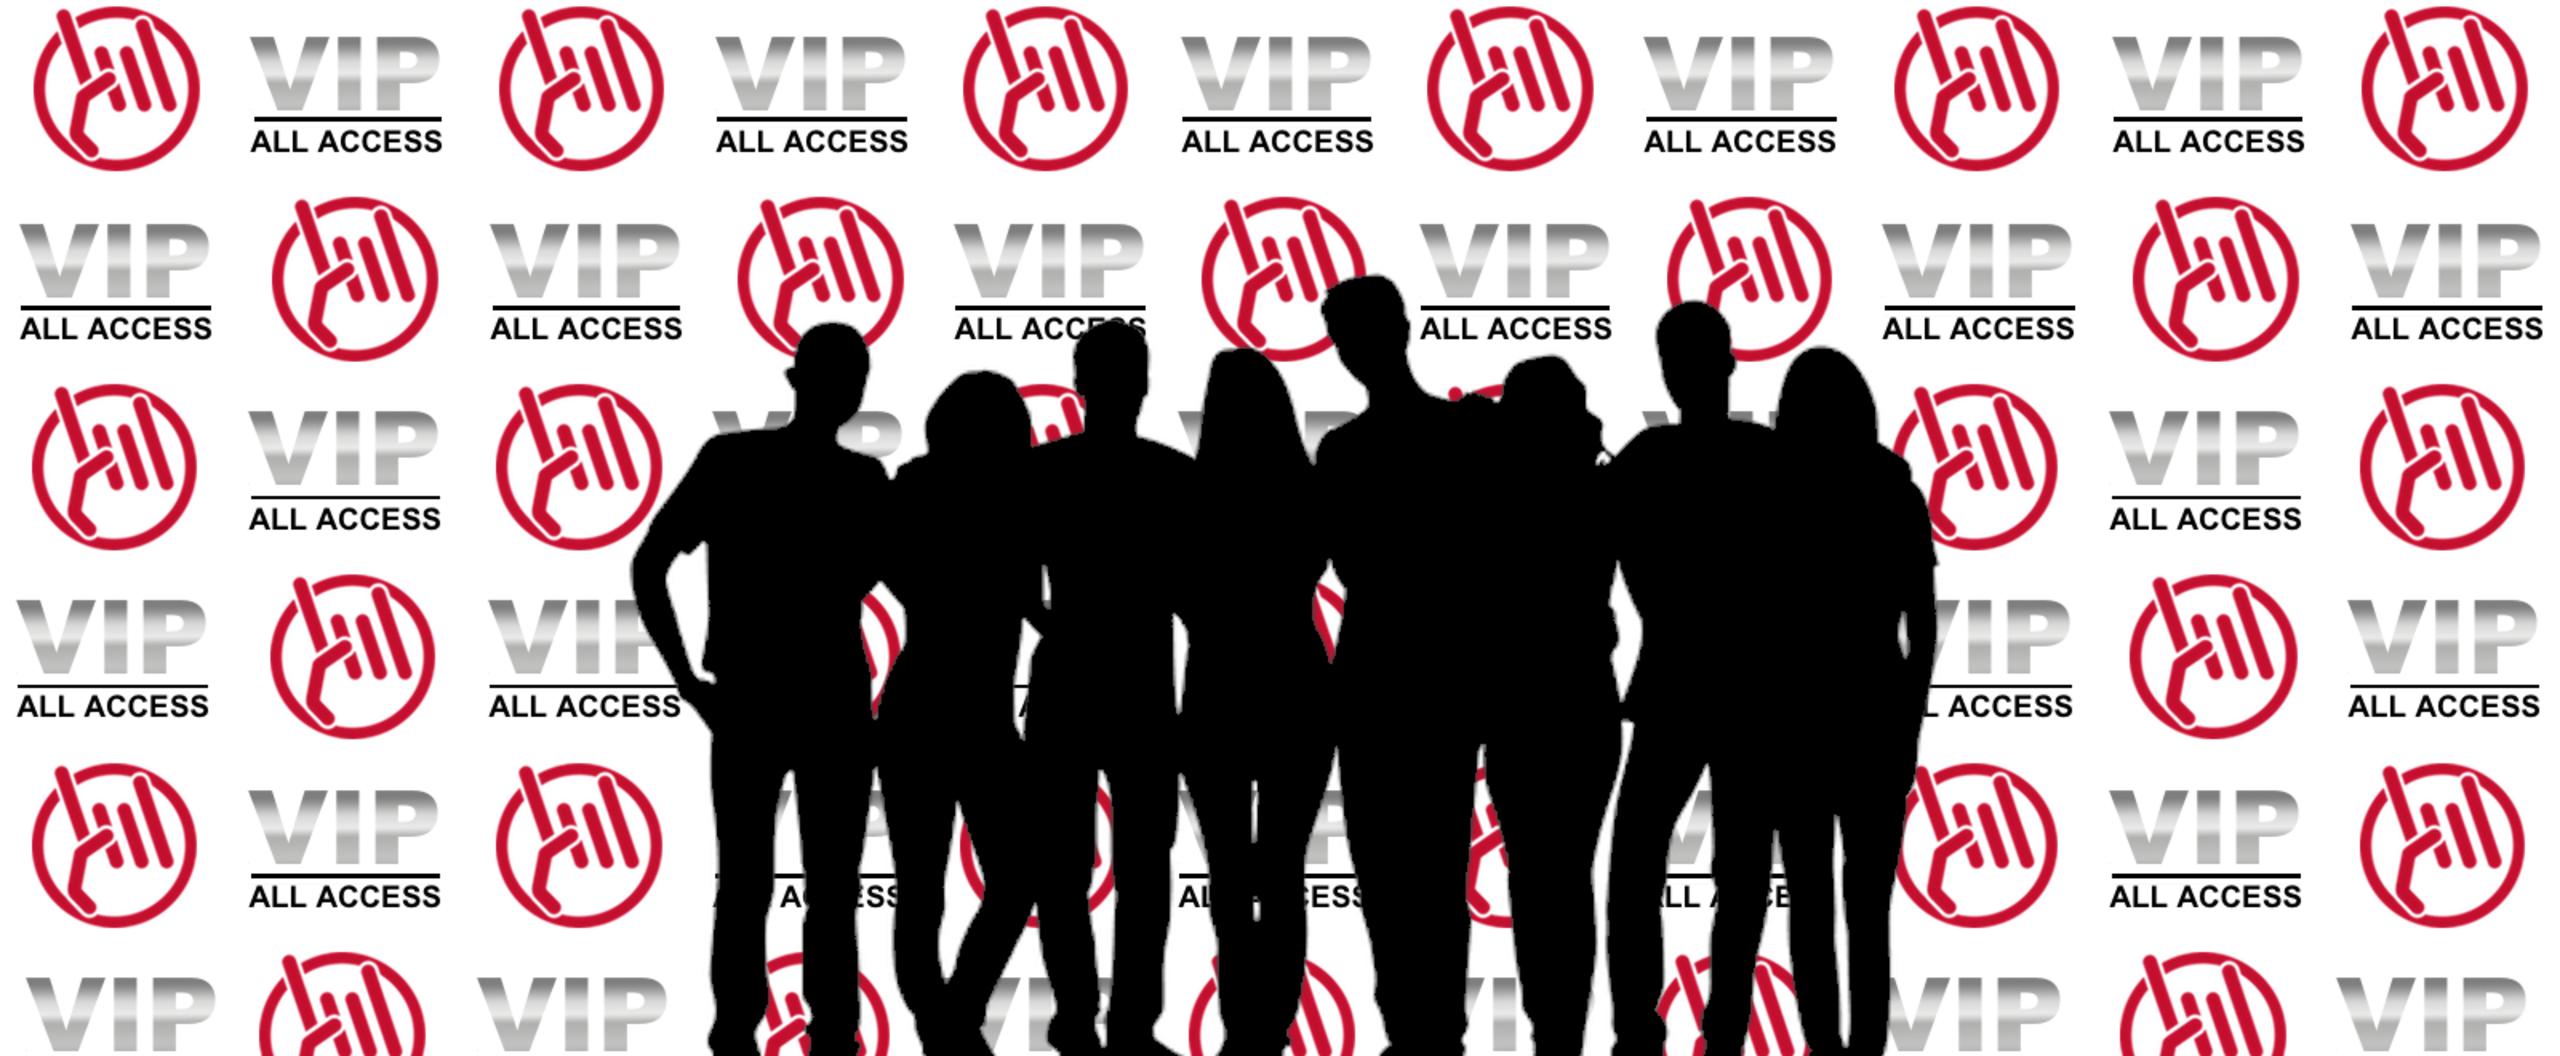 VIP Client All Access Program